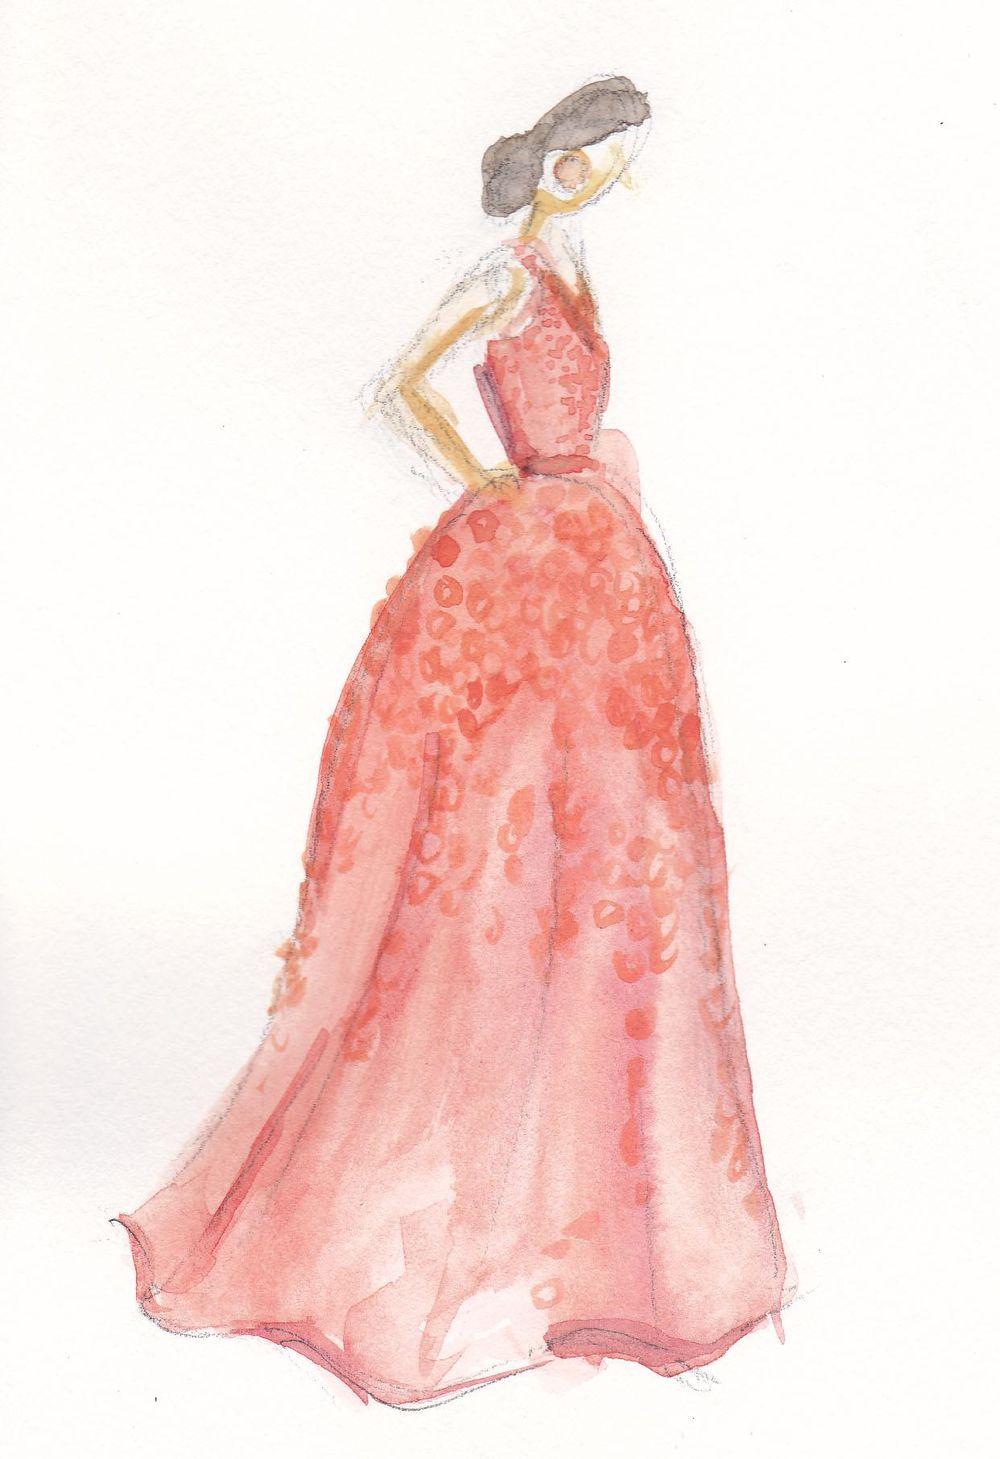 Final | Coral & Embellished - image 2 - student project